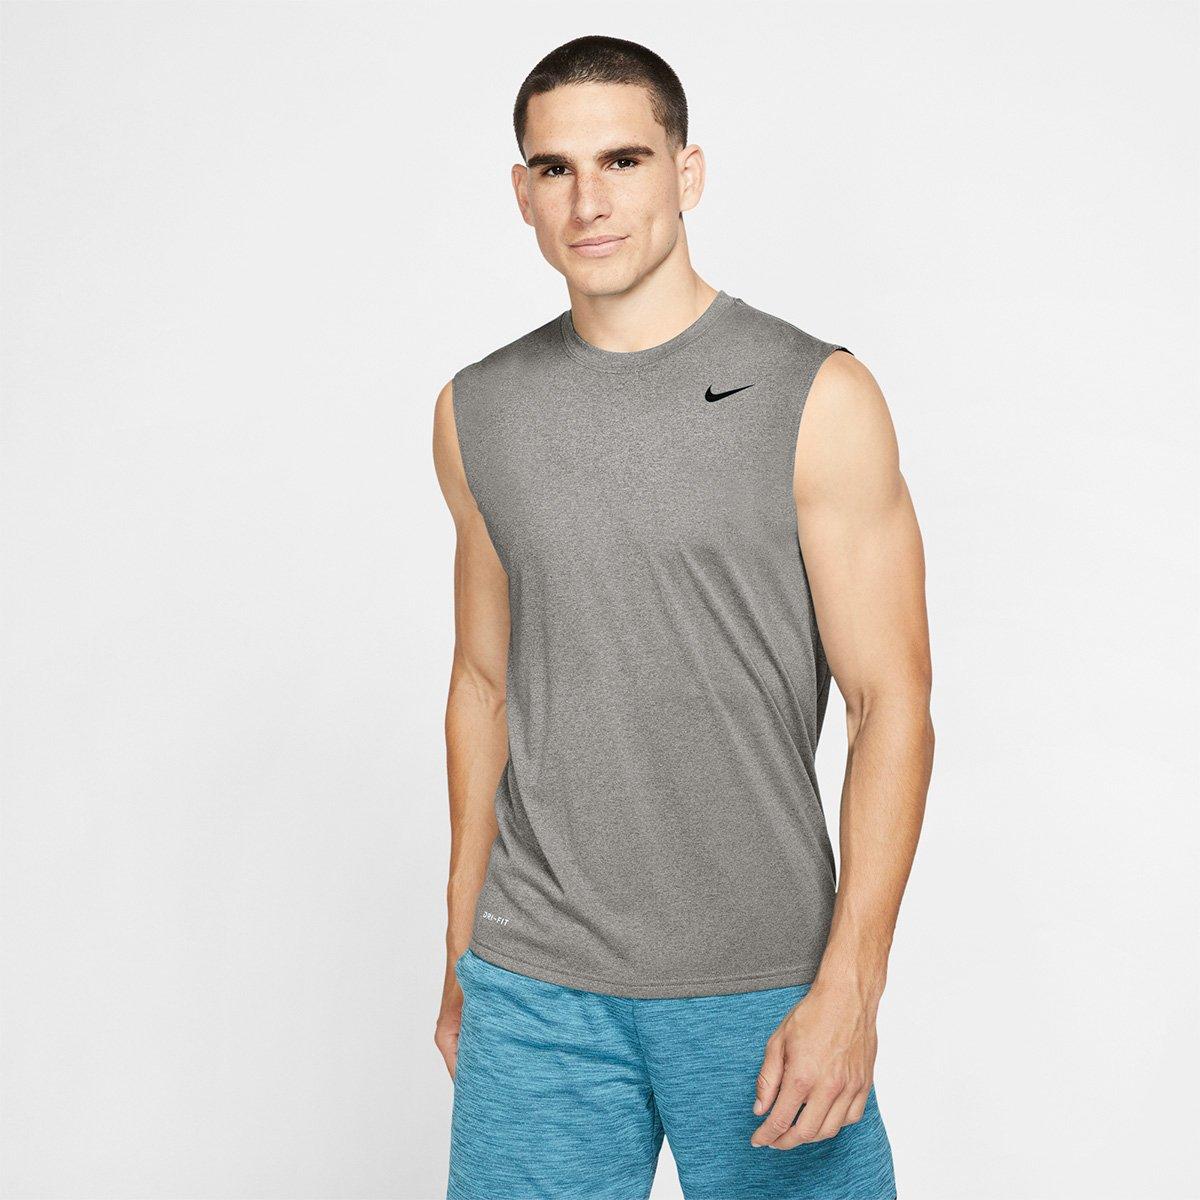 Regata Nike Legend 2.0 Tee Masculina - Preto e Cinza - Compre Agora ... 6baa0171998